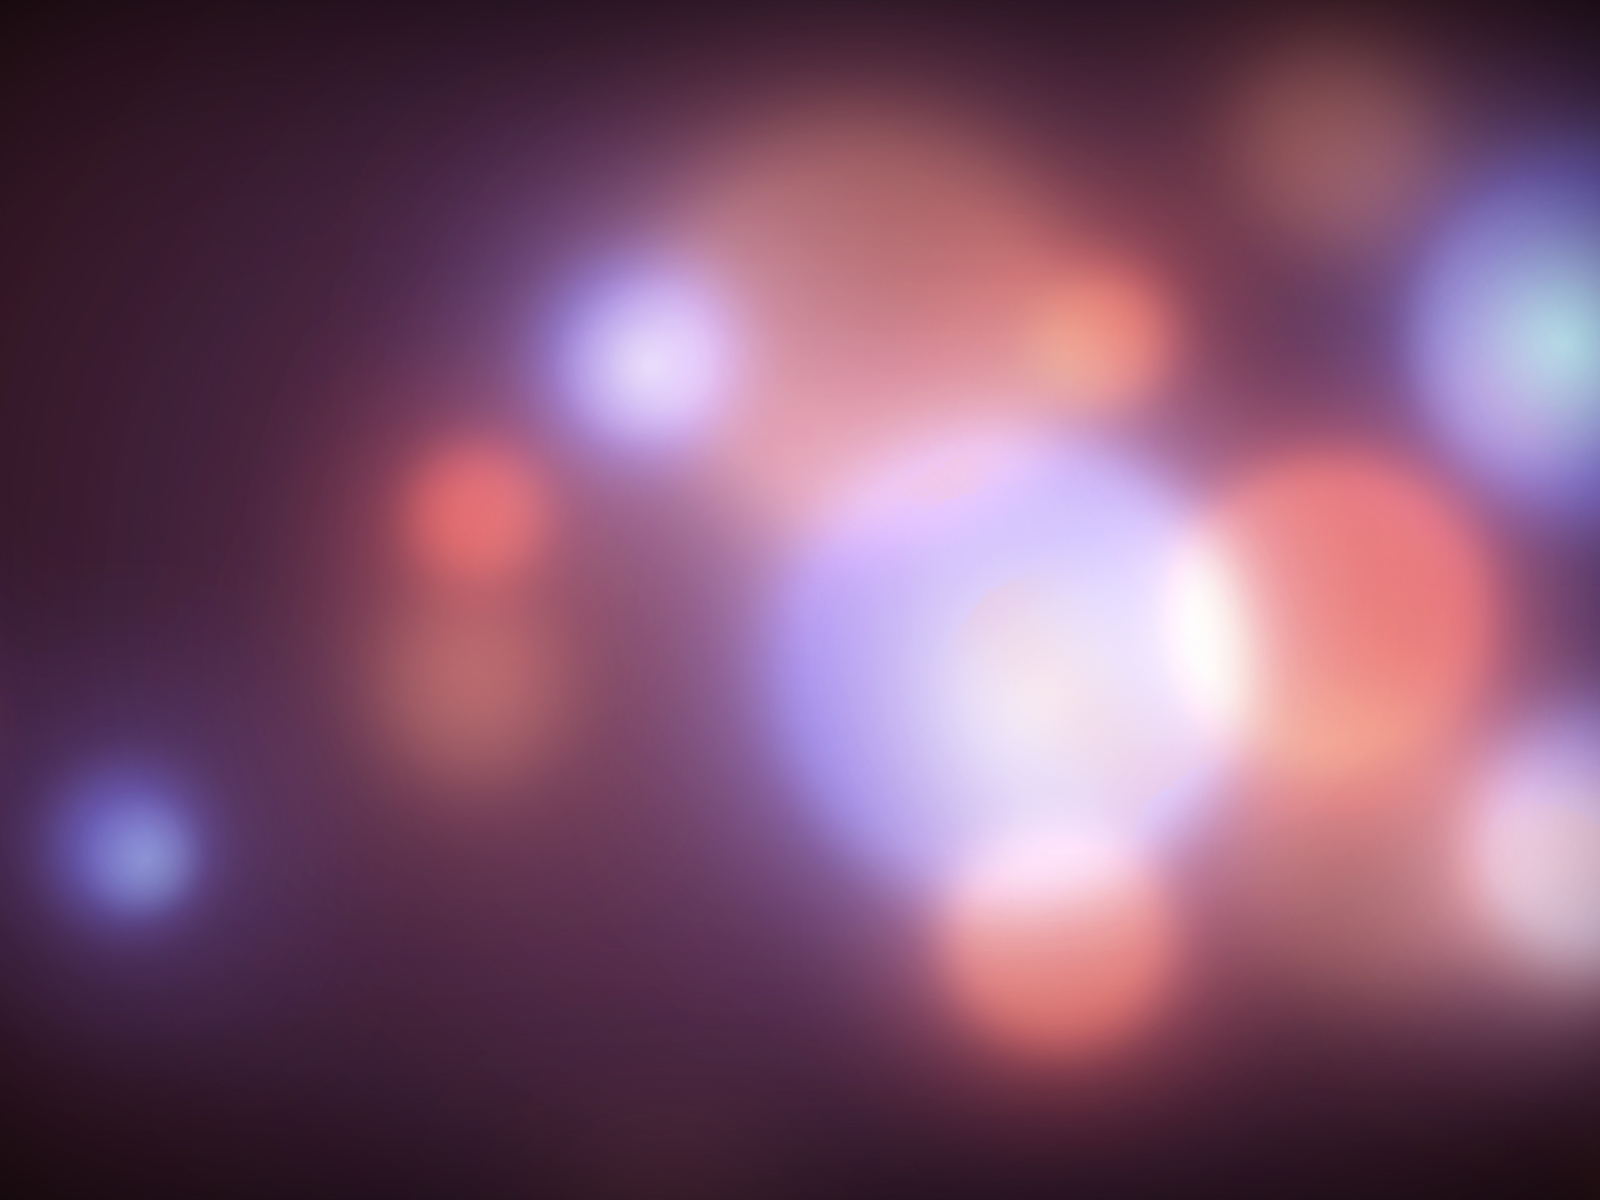 Light Effect Hd Wallpaper Background Images: WallpaperfreekS: Light Effects Wallpapers 1600X1200